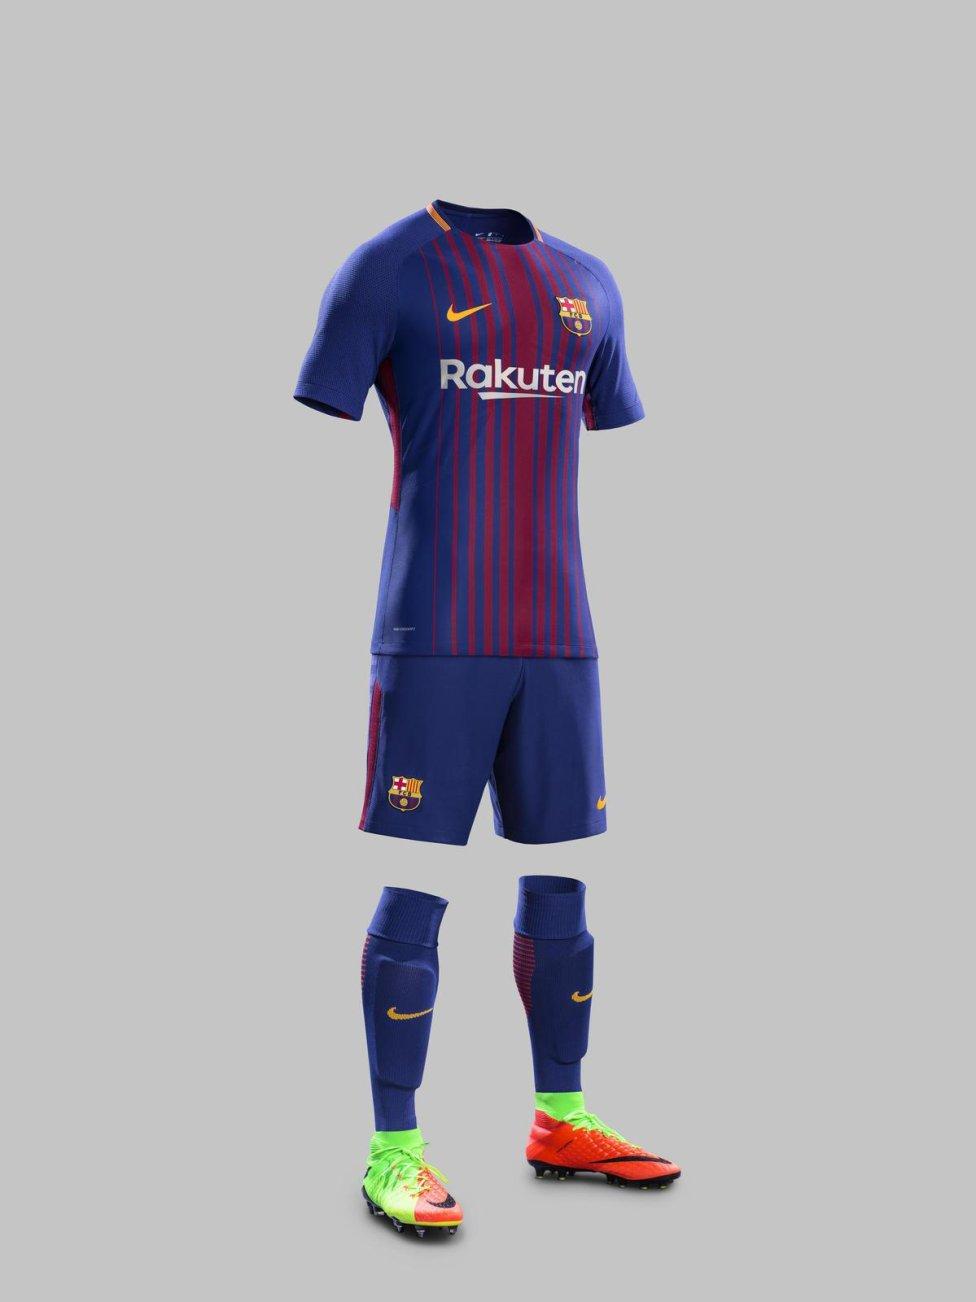 uniforme del Barcelona futbol